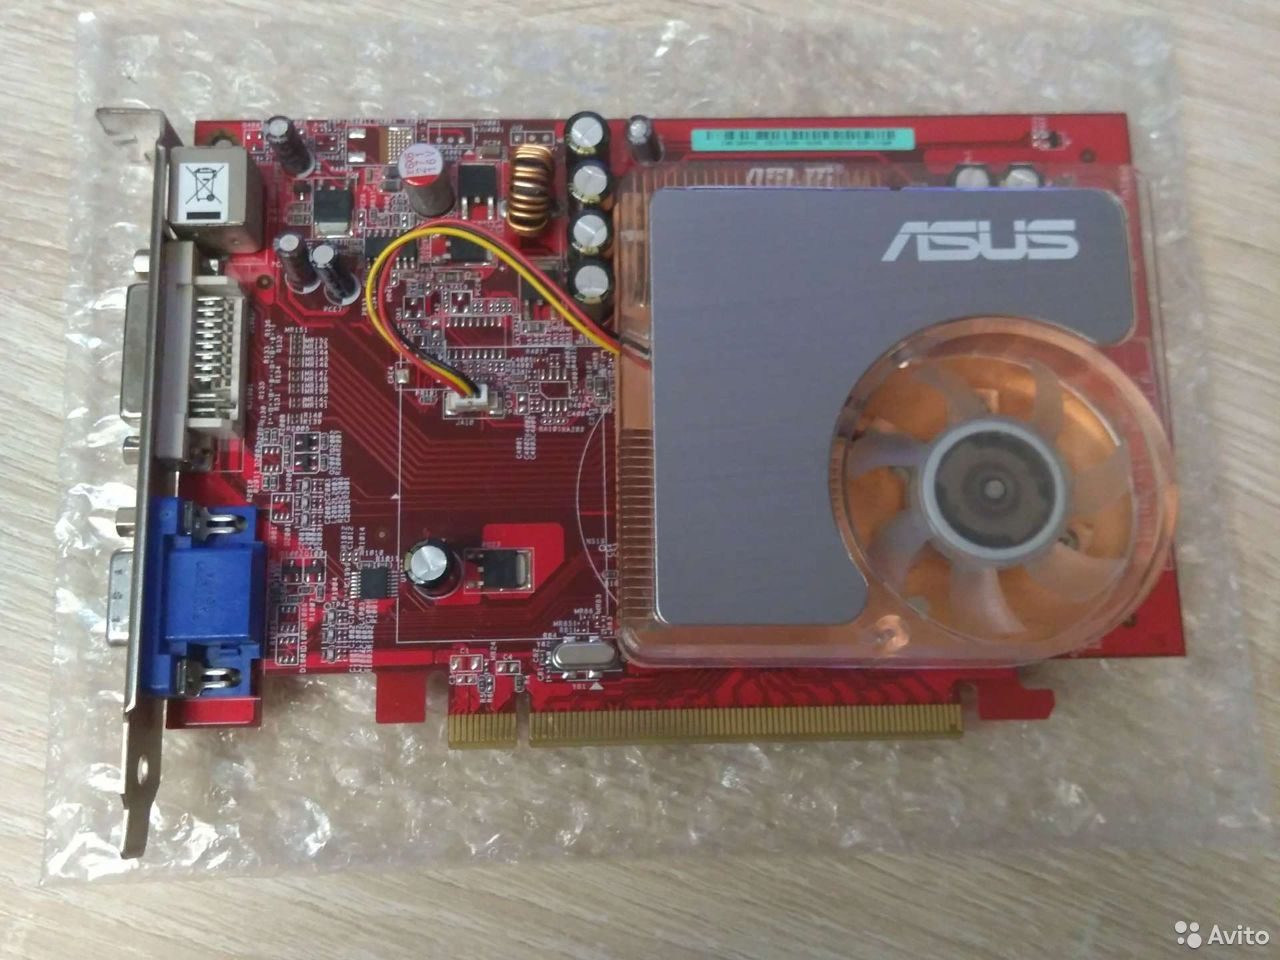 Видеокарта ATI Radeon Asus 256 Мб  89878209940 купить 1